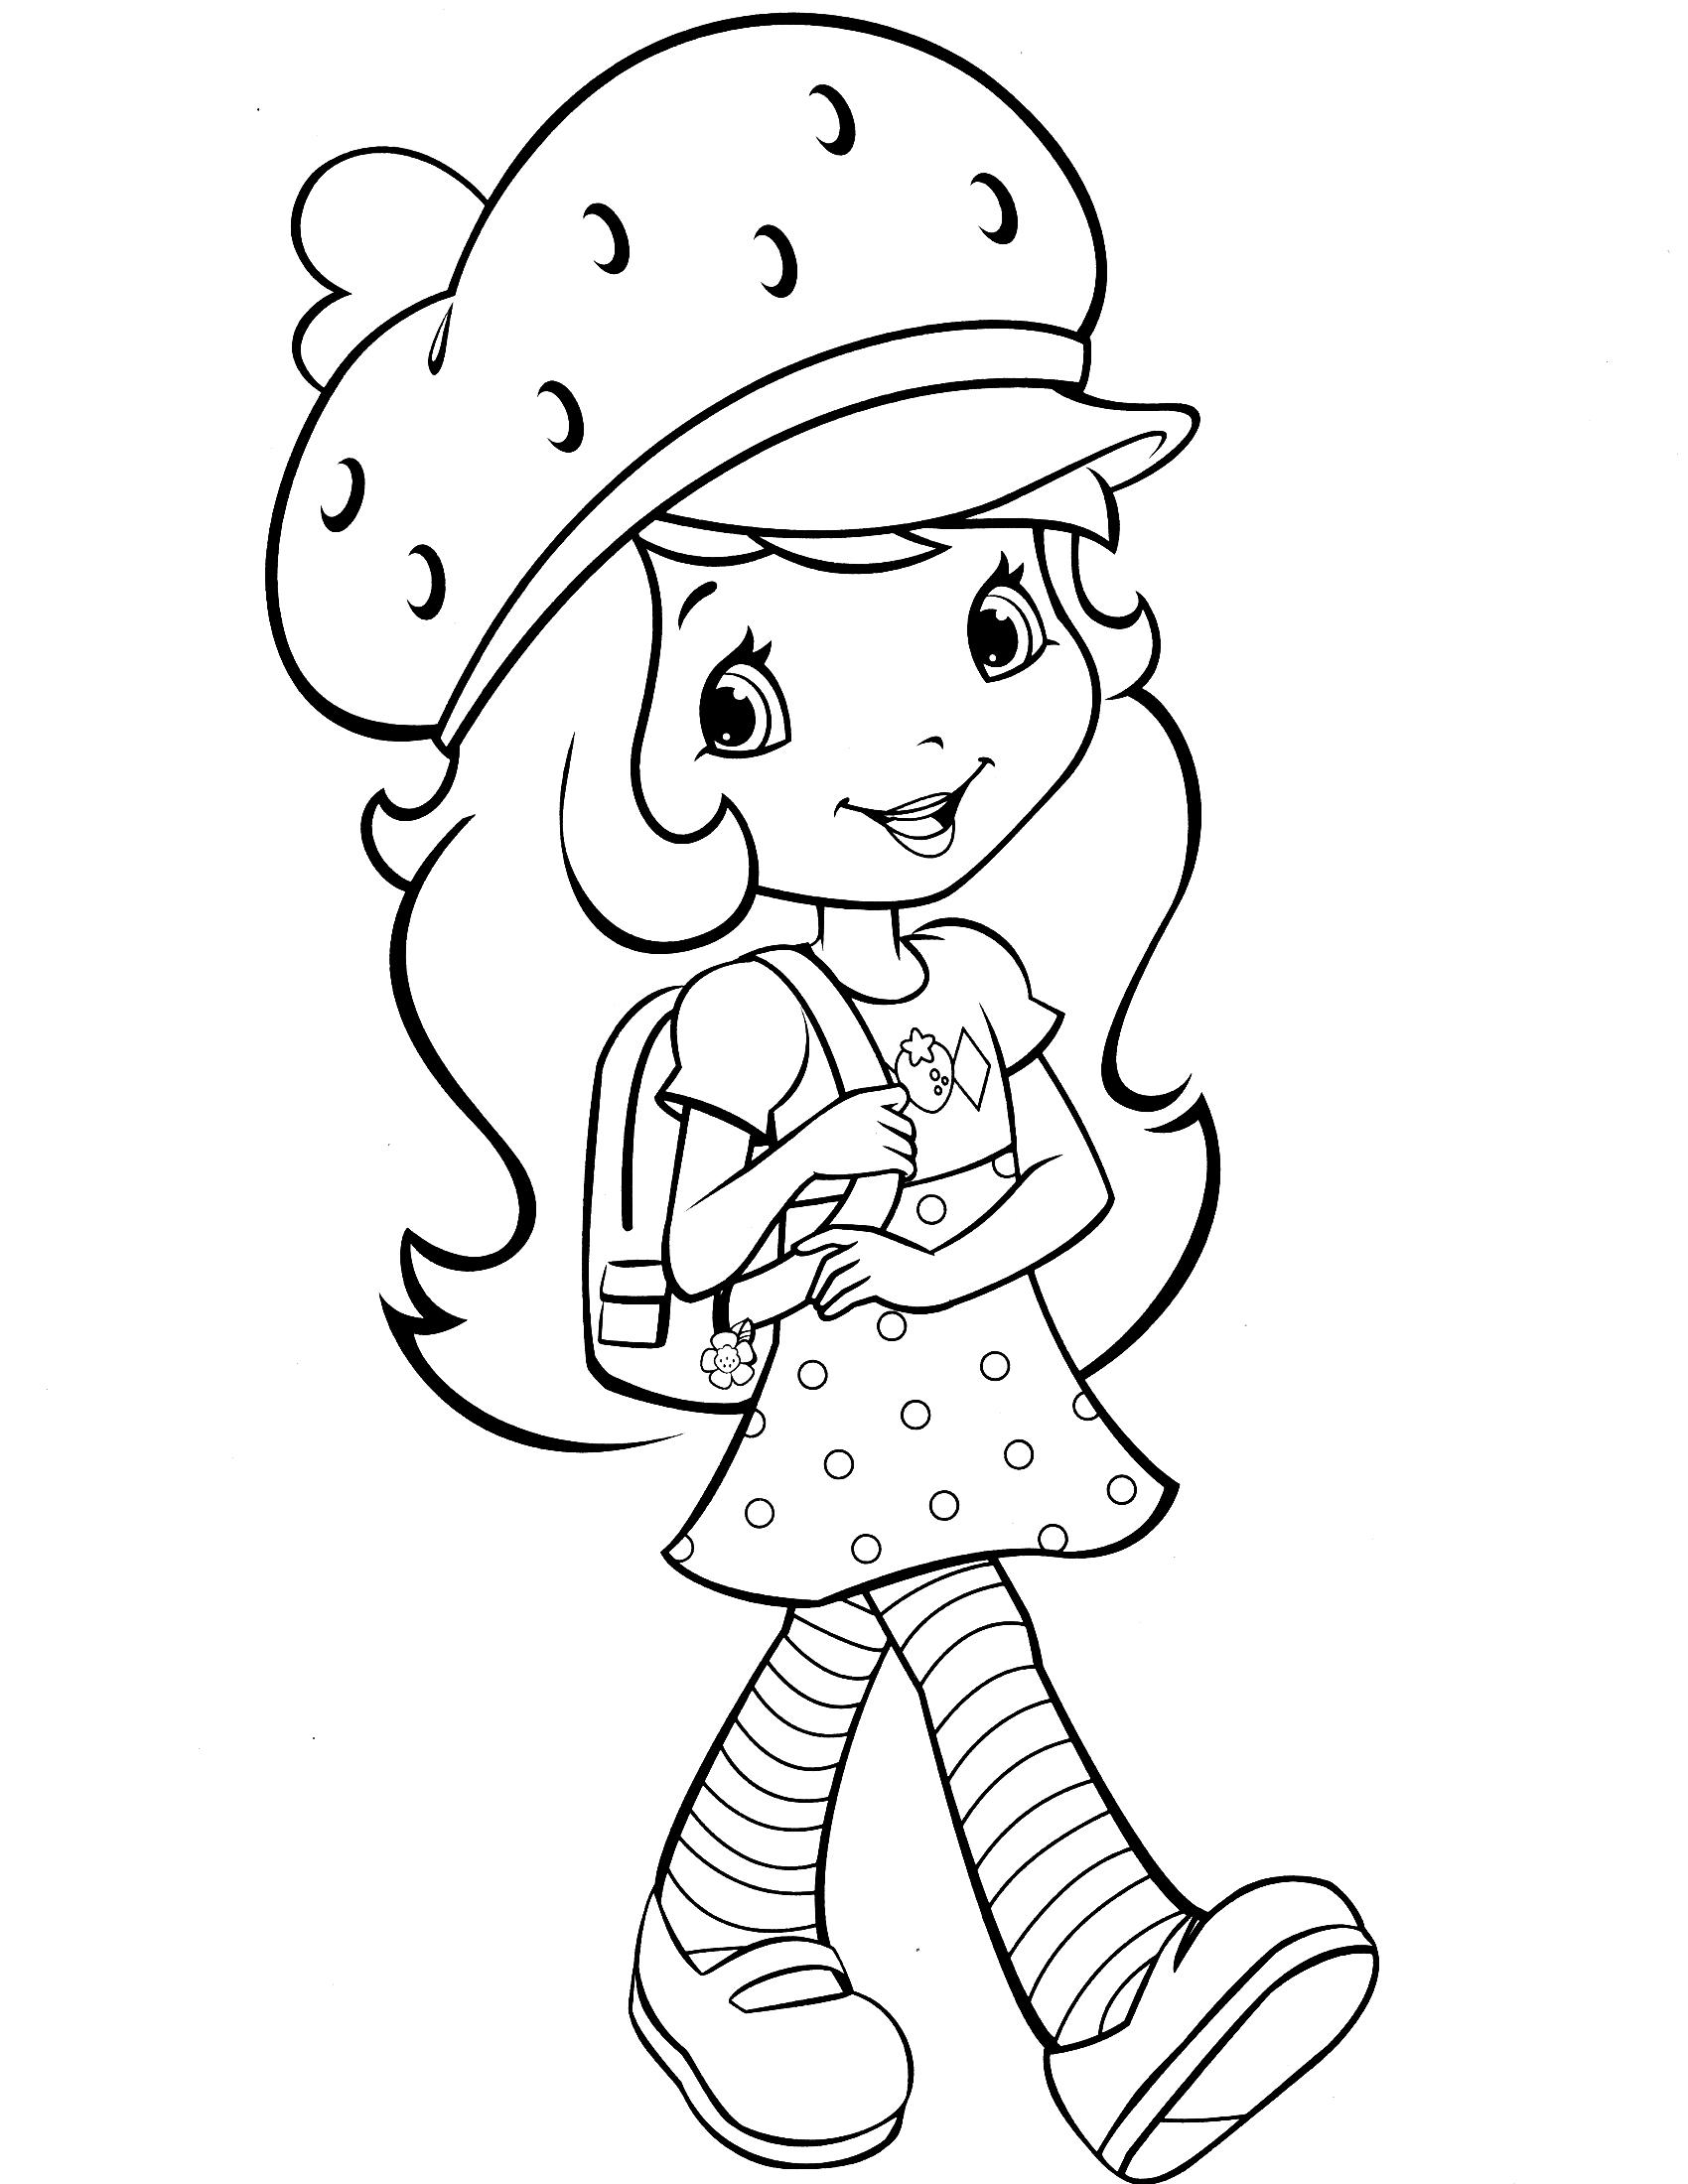 Strawberry Shortcake Drawing at GetDrawings | Free download